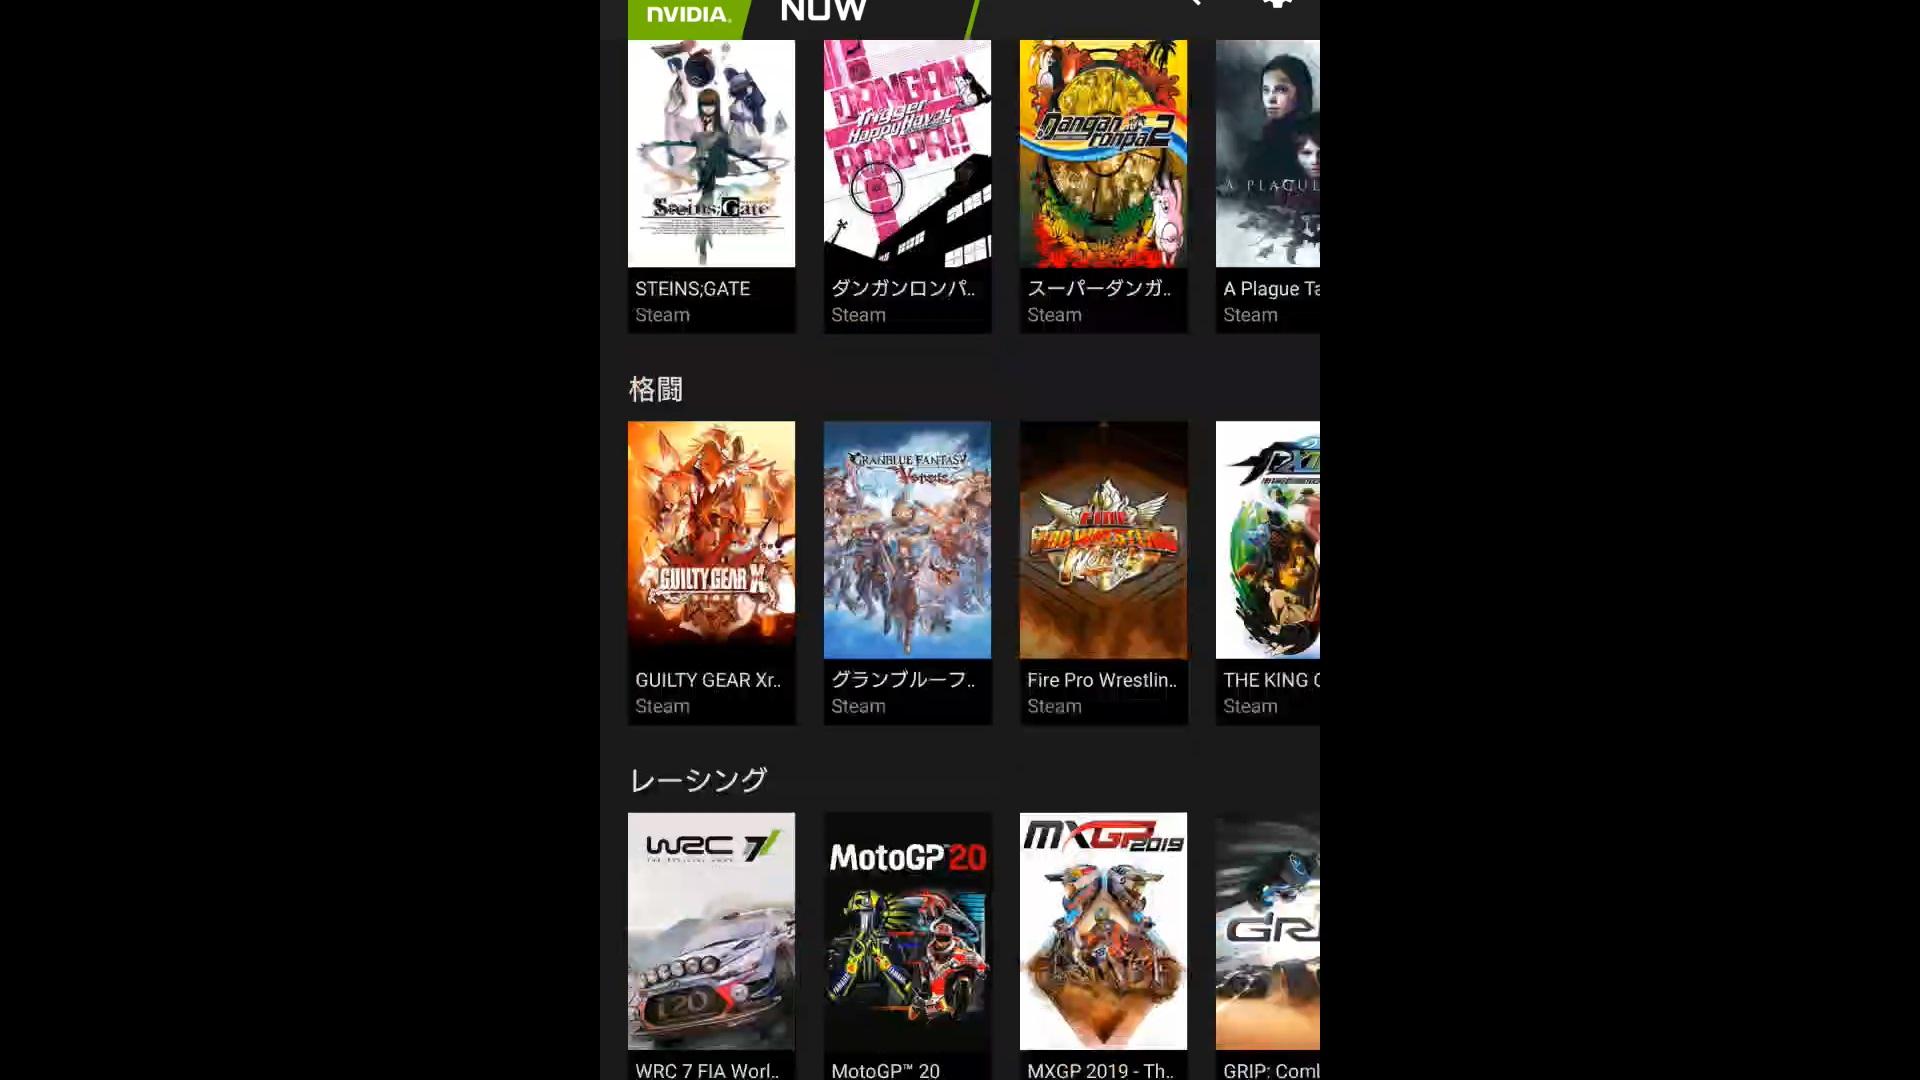 GeForce Nowにログインするとゲームの選択画面が現れます。 steamやEpic game、UPLAYで購入したゲームのみプレイ可能です。